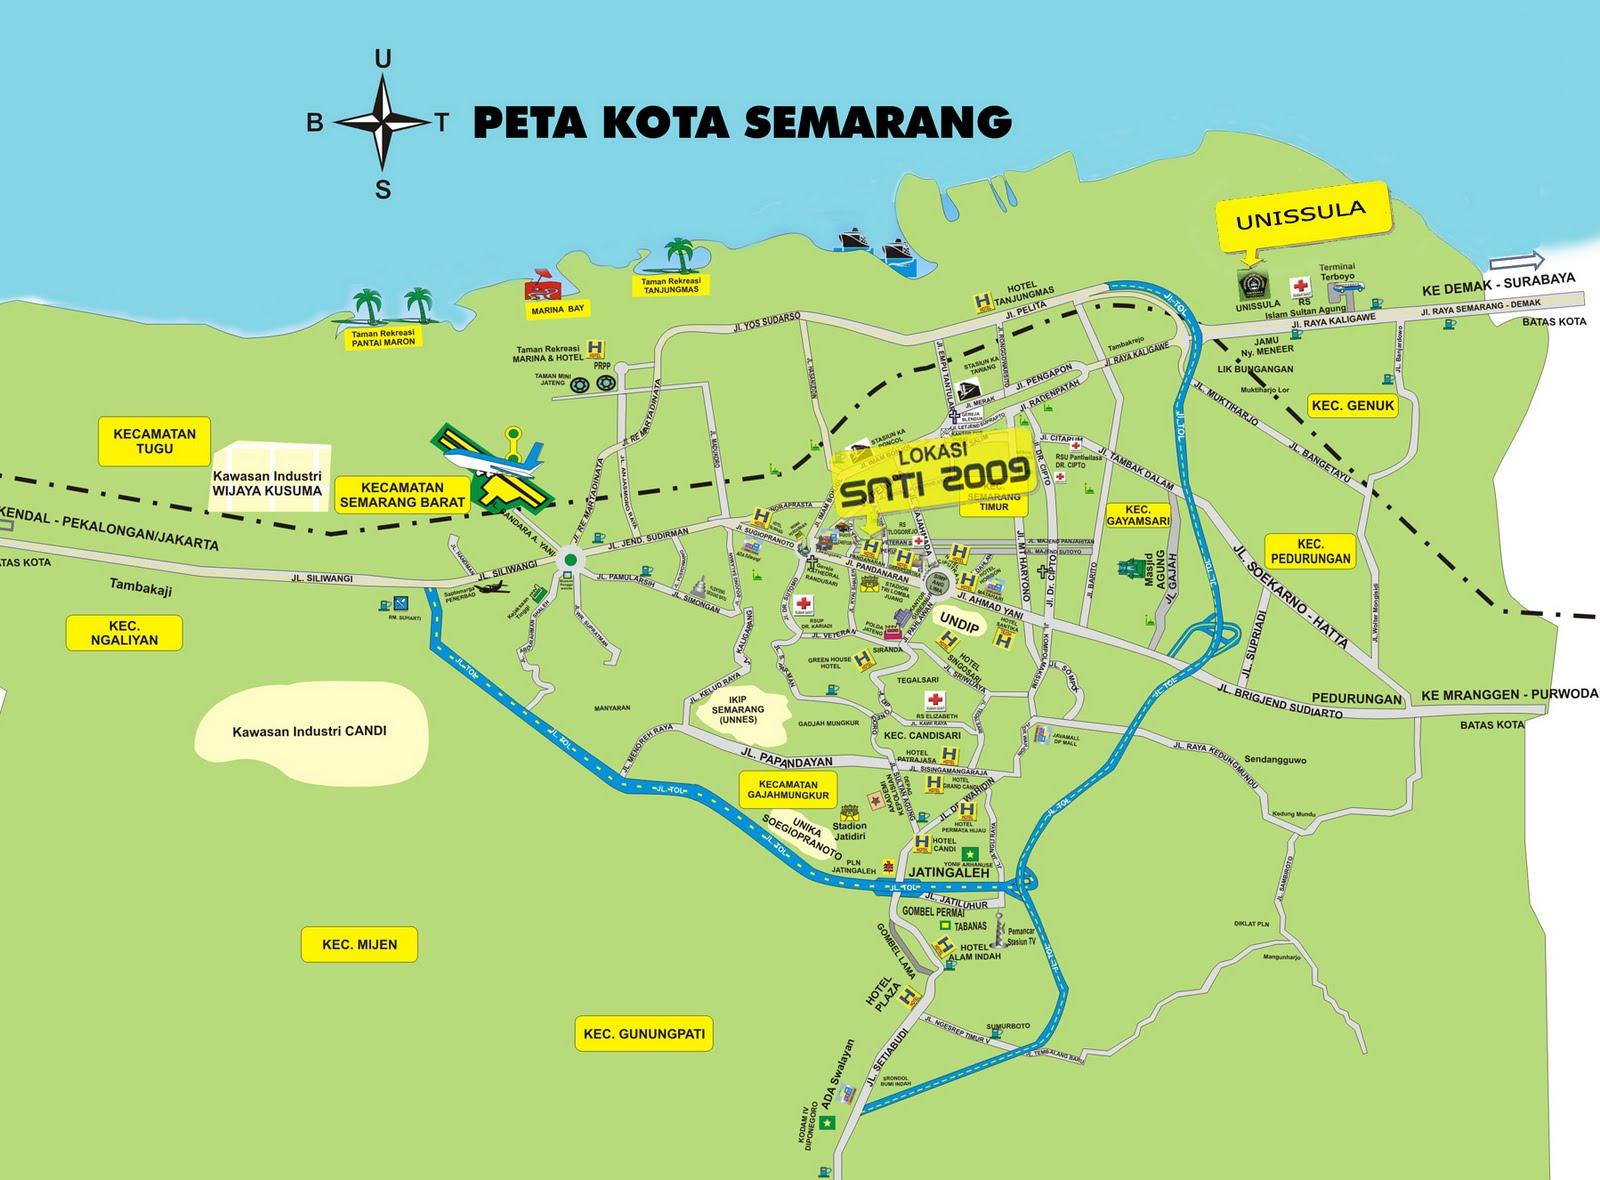 Kota Kendal 2013 Info Terbaru 2016 Info Harian Terbaru Kang Maning Wisata Semarang